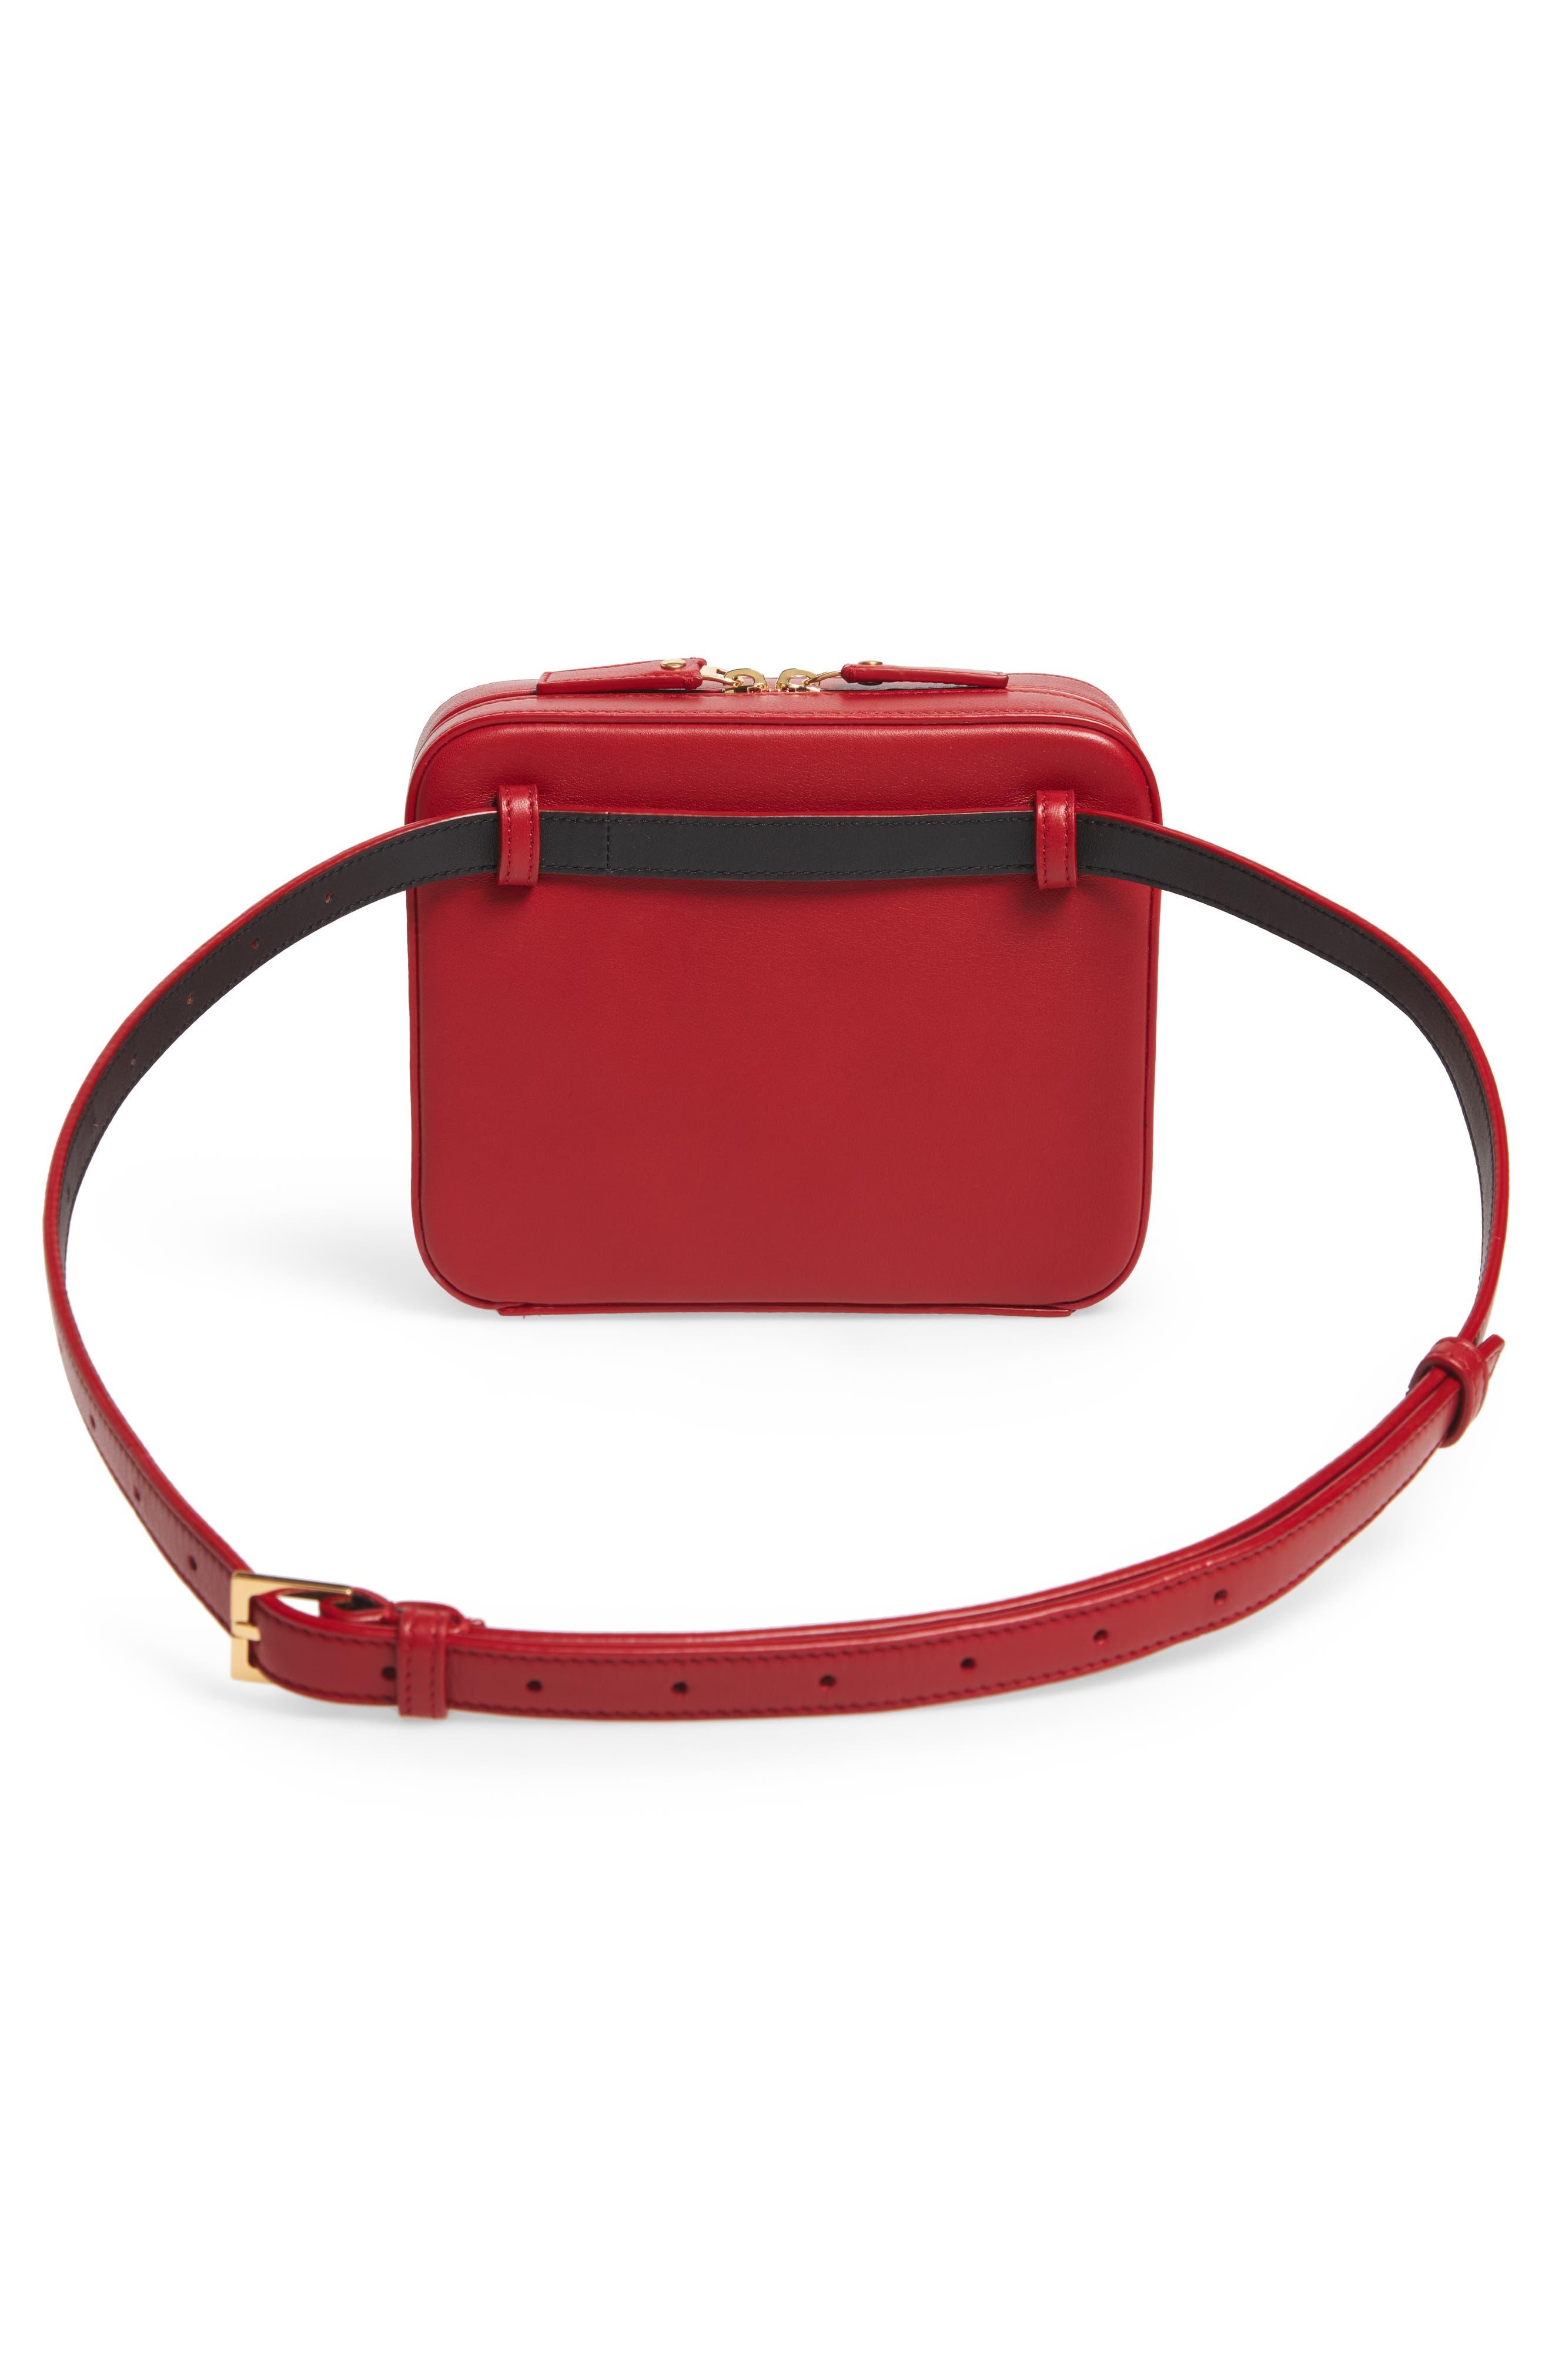 SAINT LAURENT, Vicky Lambskin Leather Belt Bag, Alternate thumbnail 4, color, ROUGE EROS